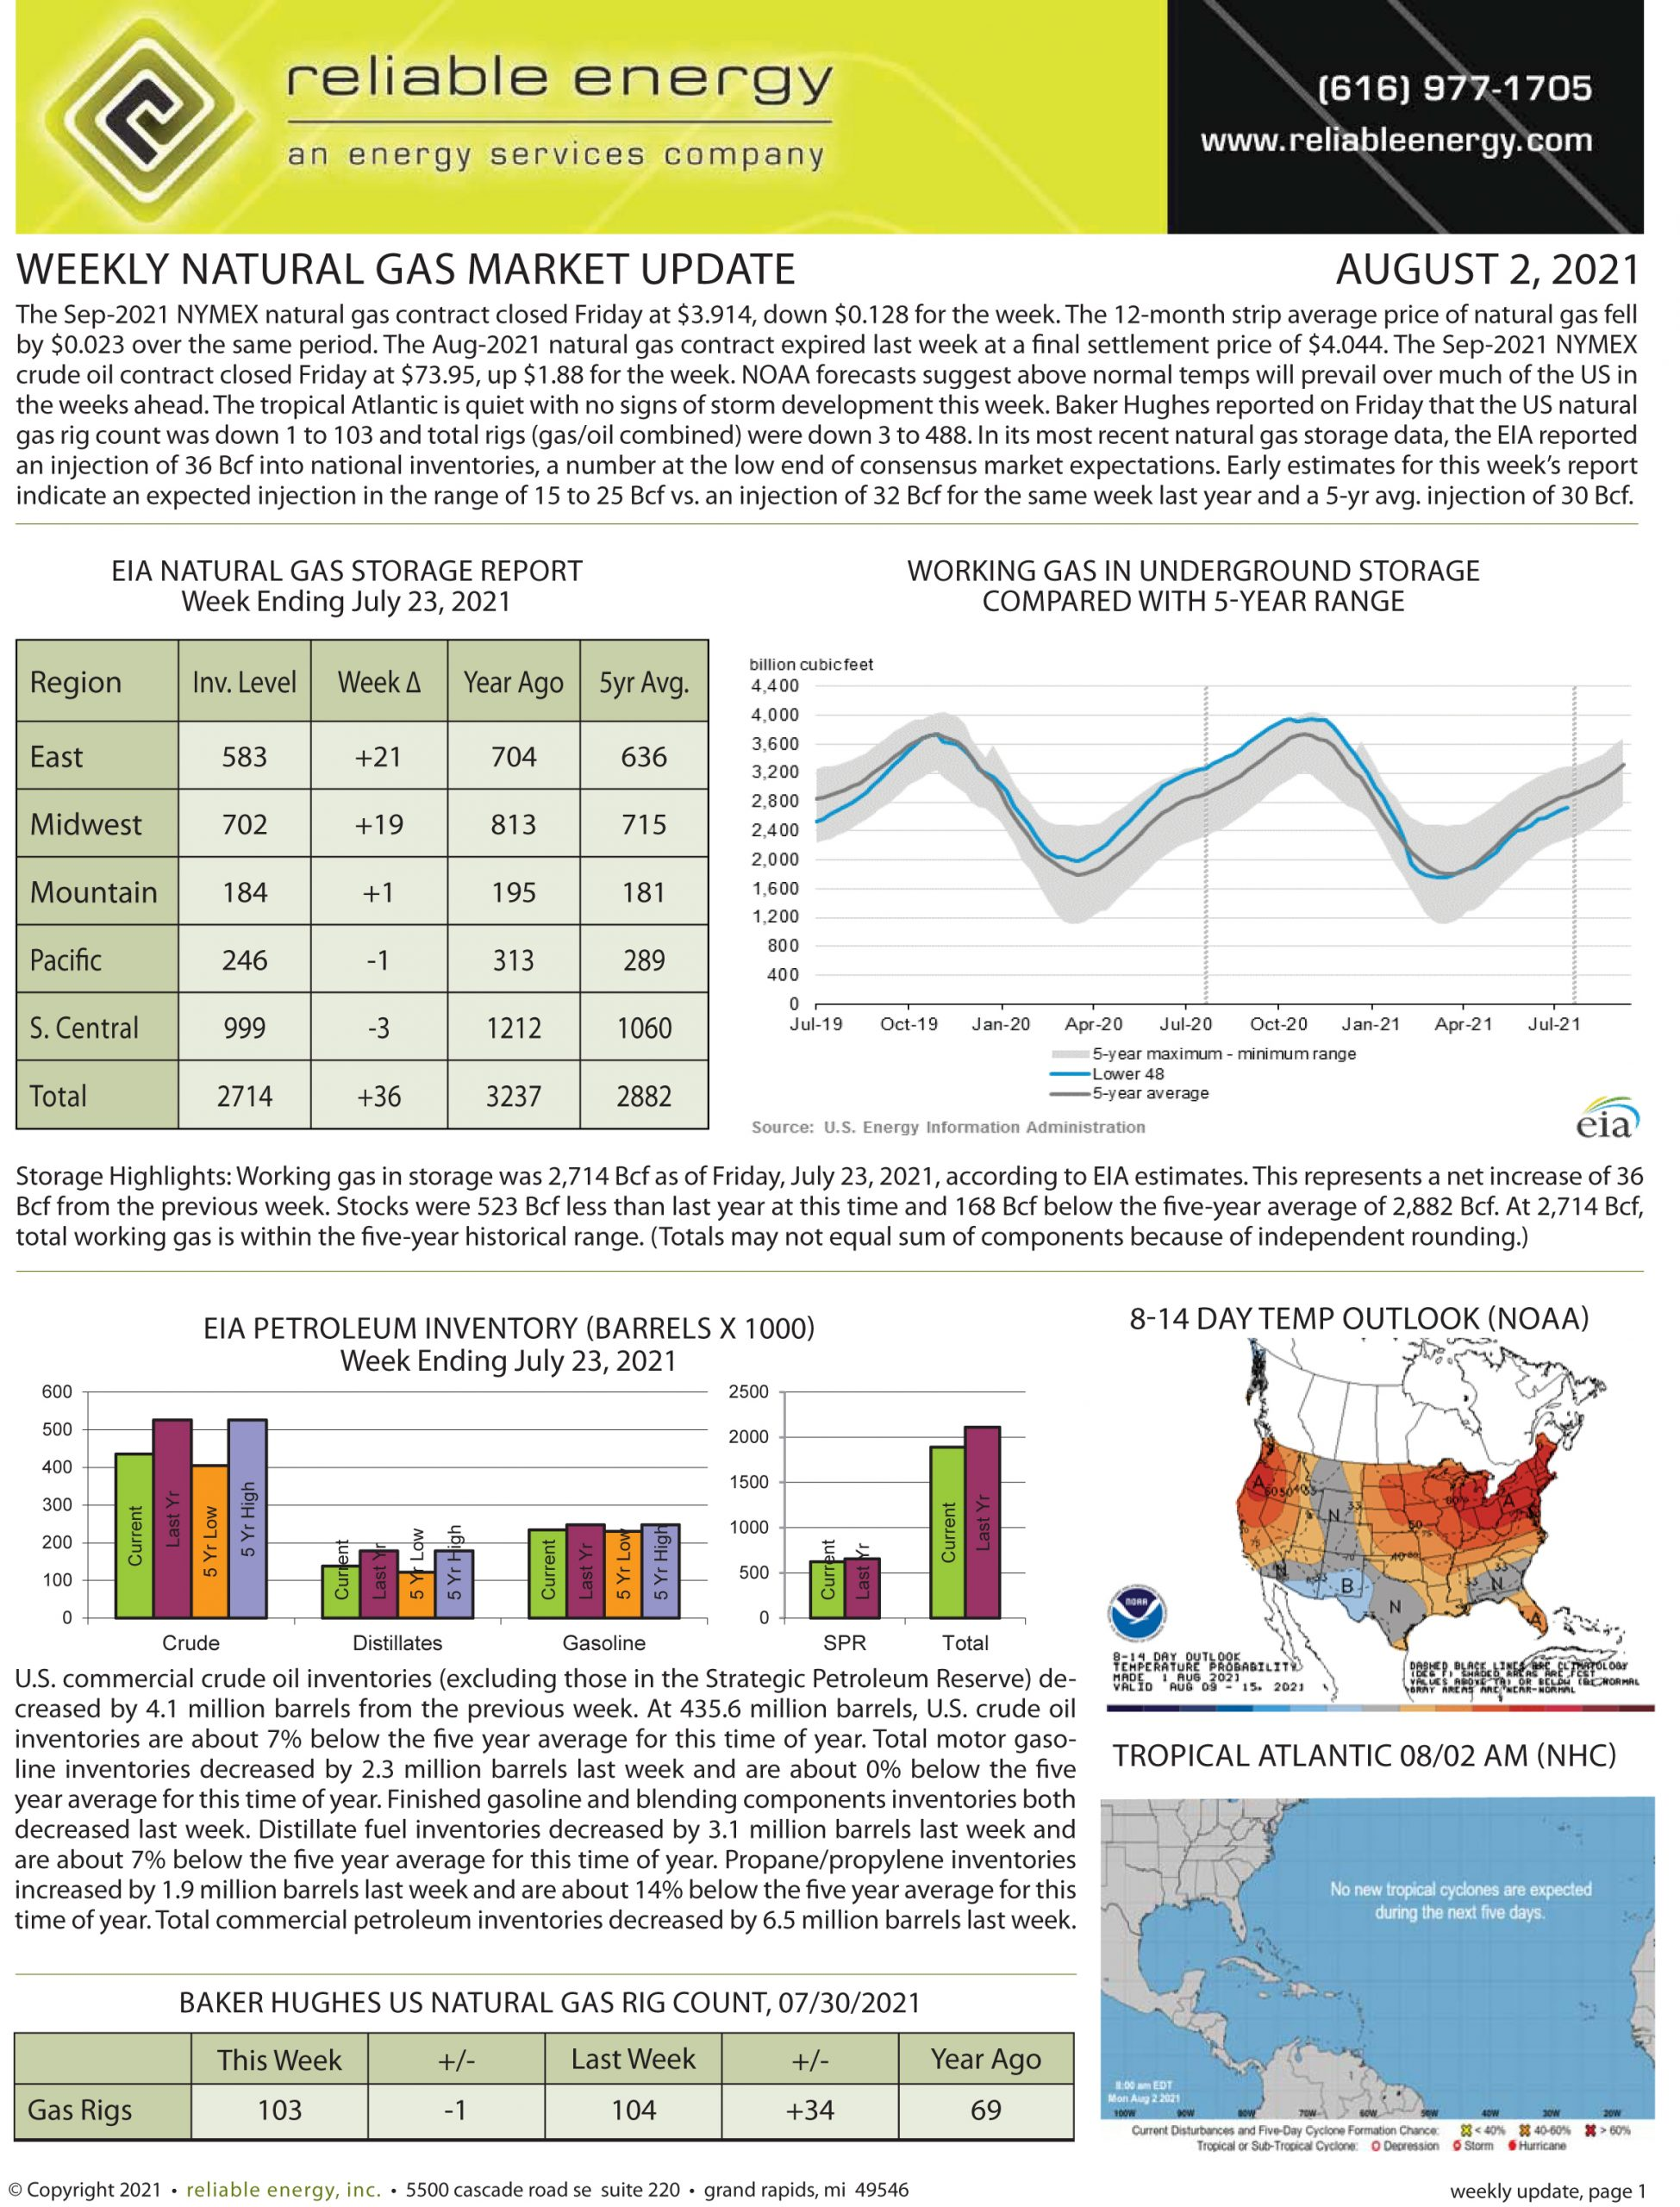 Natural Gas Market Update – August 2, 2021